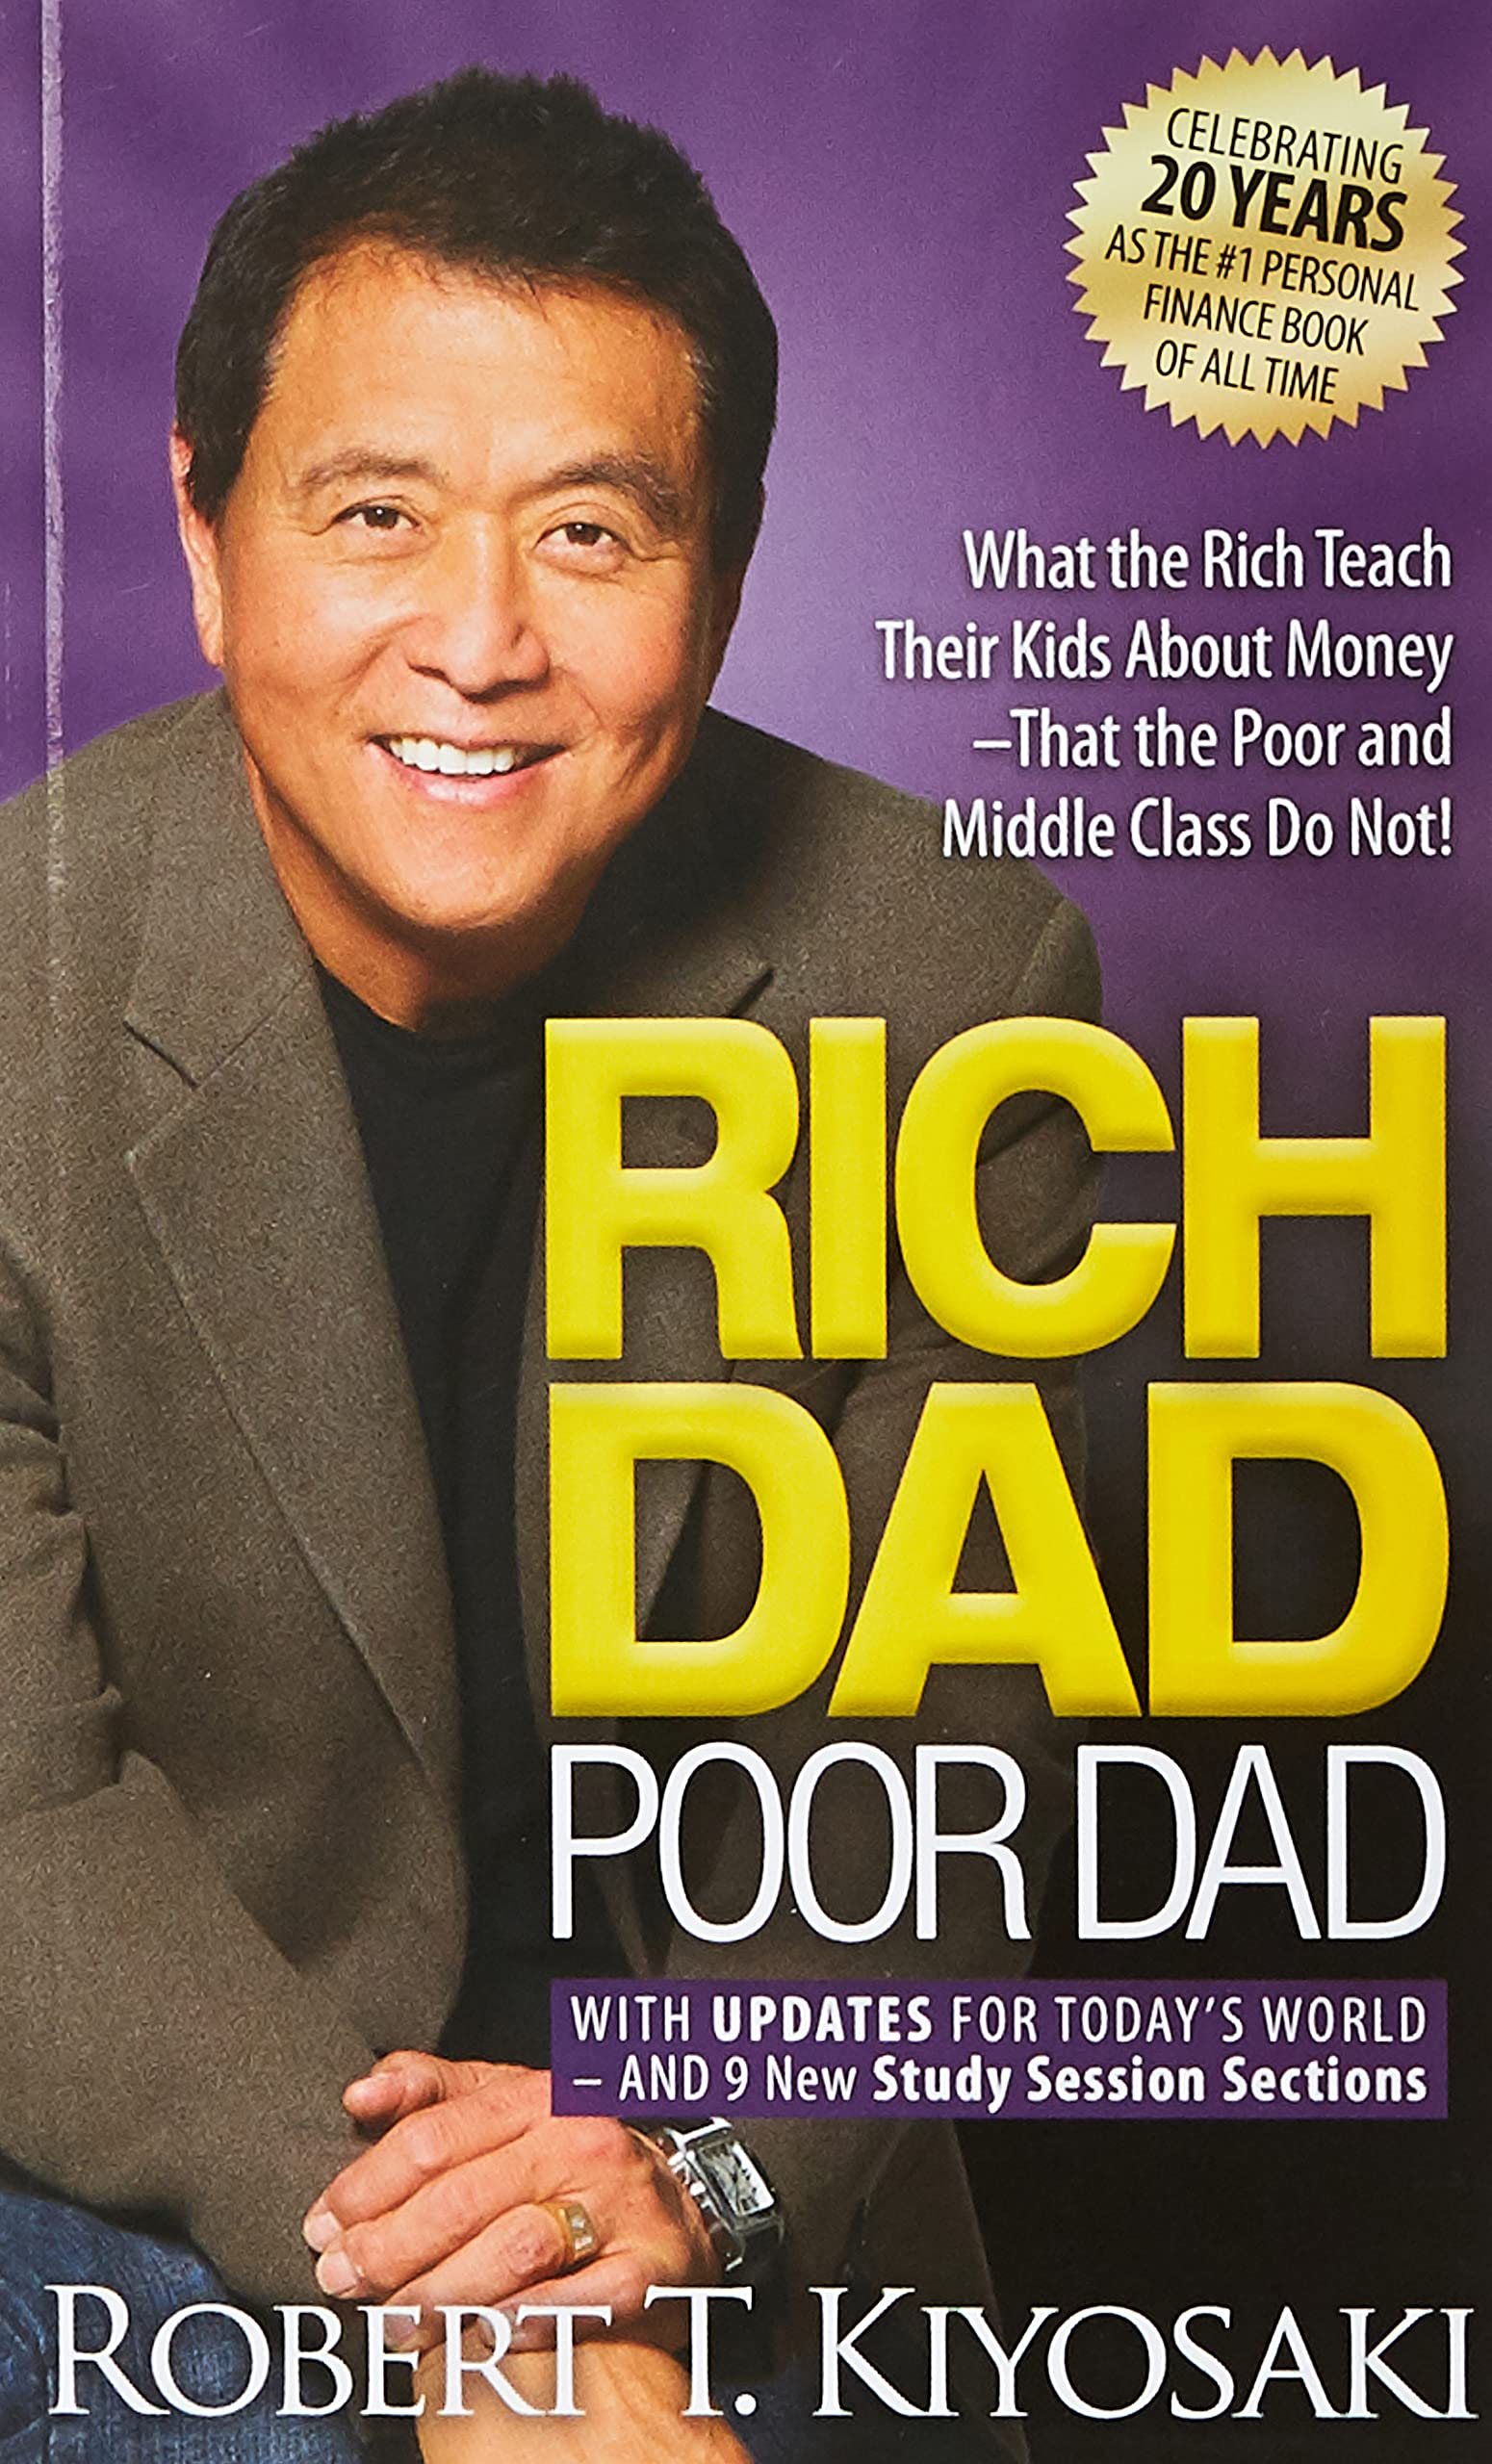 Rich Dad Poor Dad By Robert Kiyosaki Pdf By Jane Wir Issuu